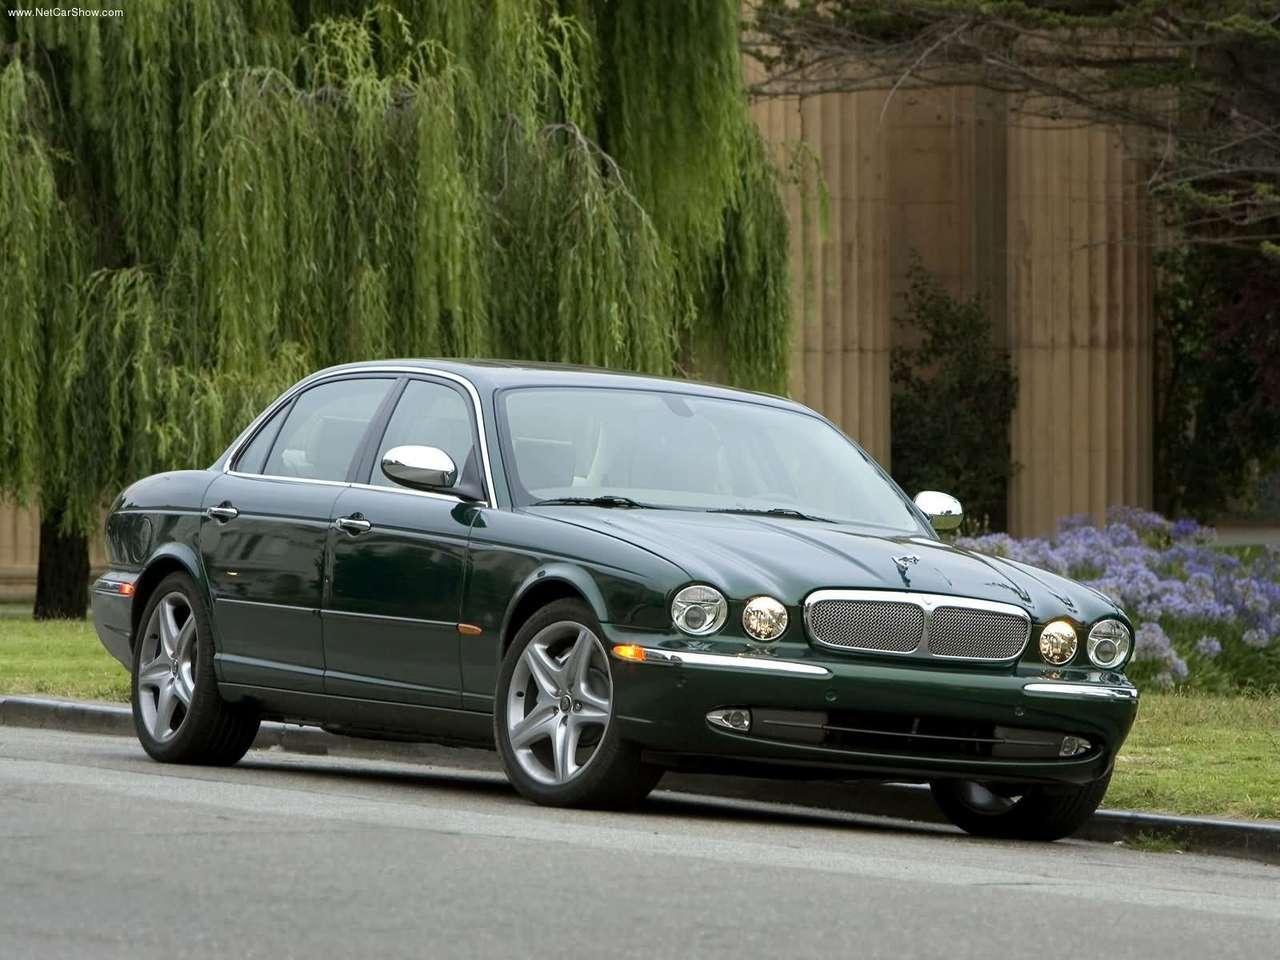 http://3.bp.blogspot.com/-y8dBZDqo2ZM/TZljufHyjUI/AAAAAAAACfk/URpisX_A6n0/s1600/Jaguar-XJ_Super_V8_2005_1280x960_wallpaper_08.jpg